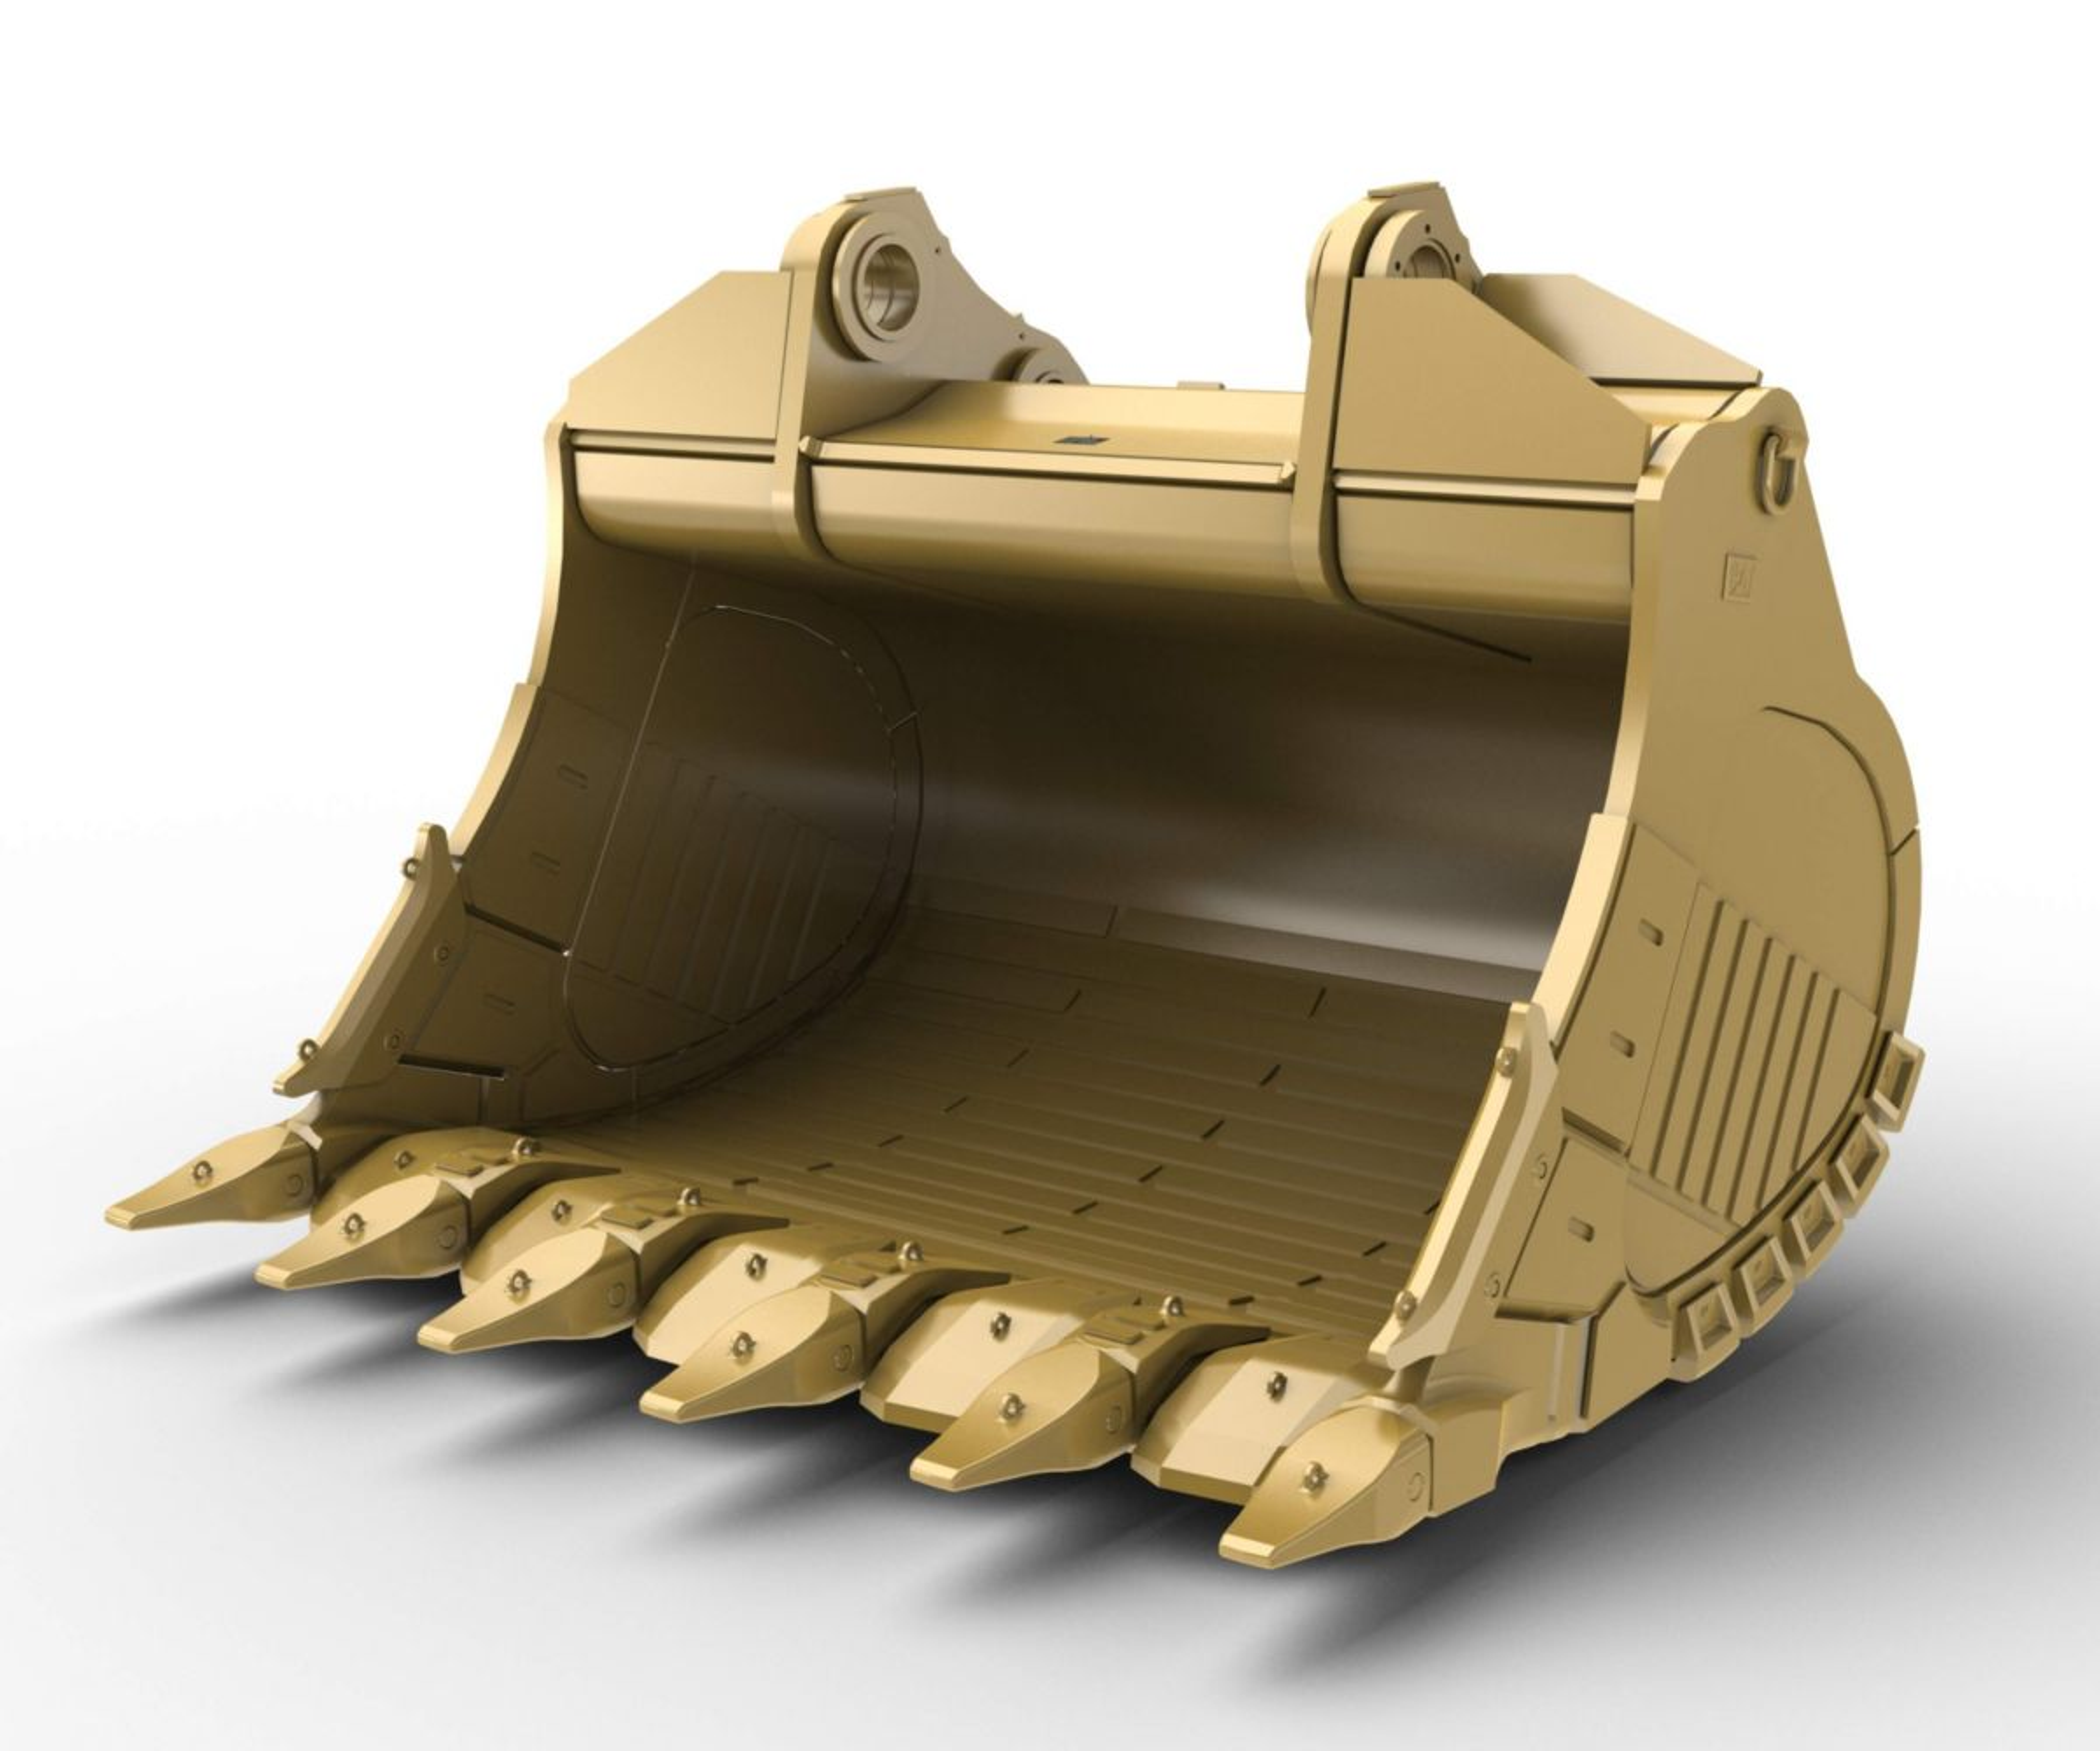 20m³ (26.2yd³) Heavy Rock bucket for the 6040 Hyd Mining Shovel>